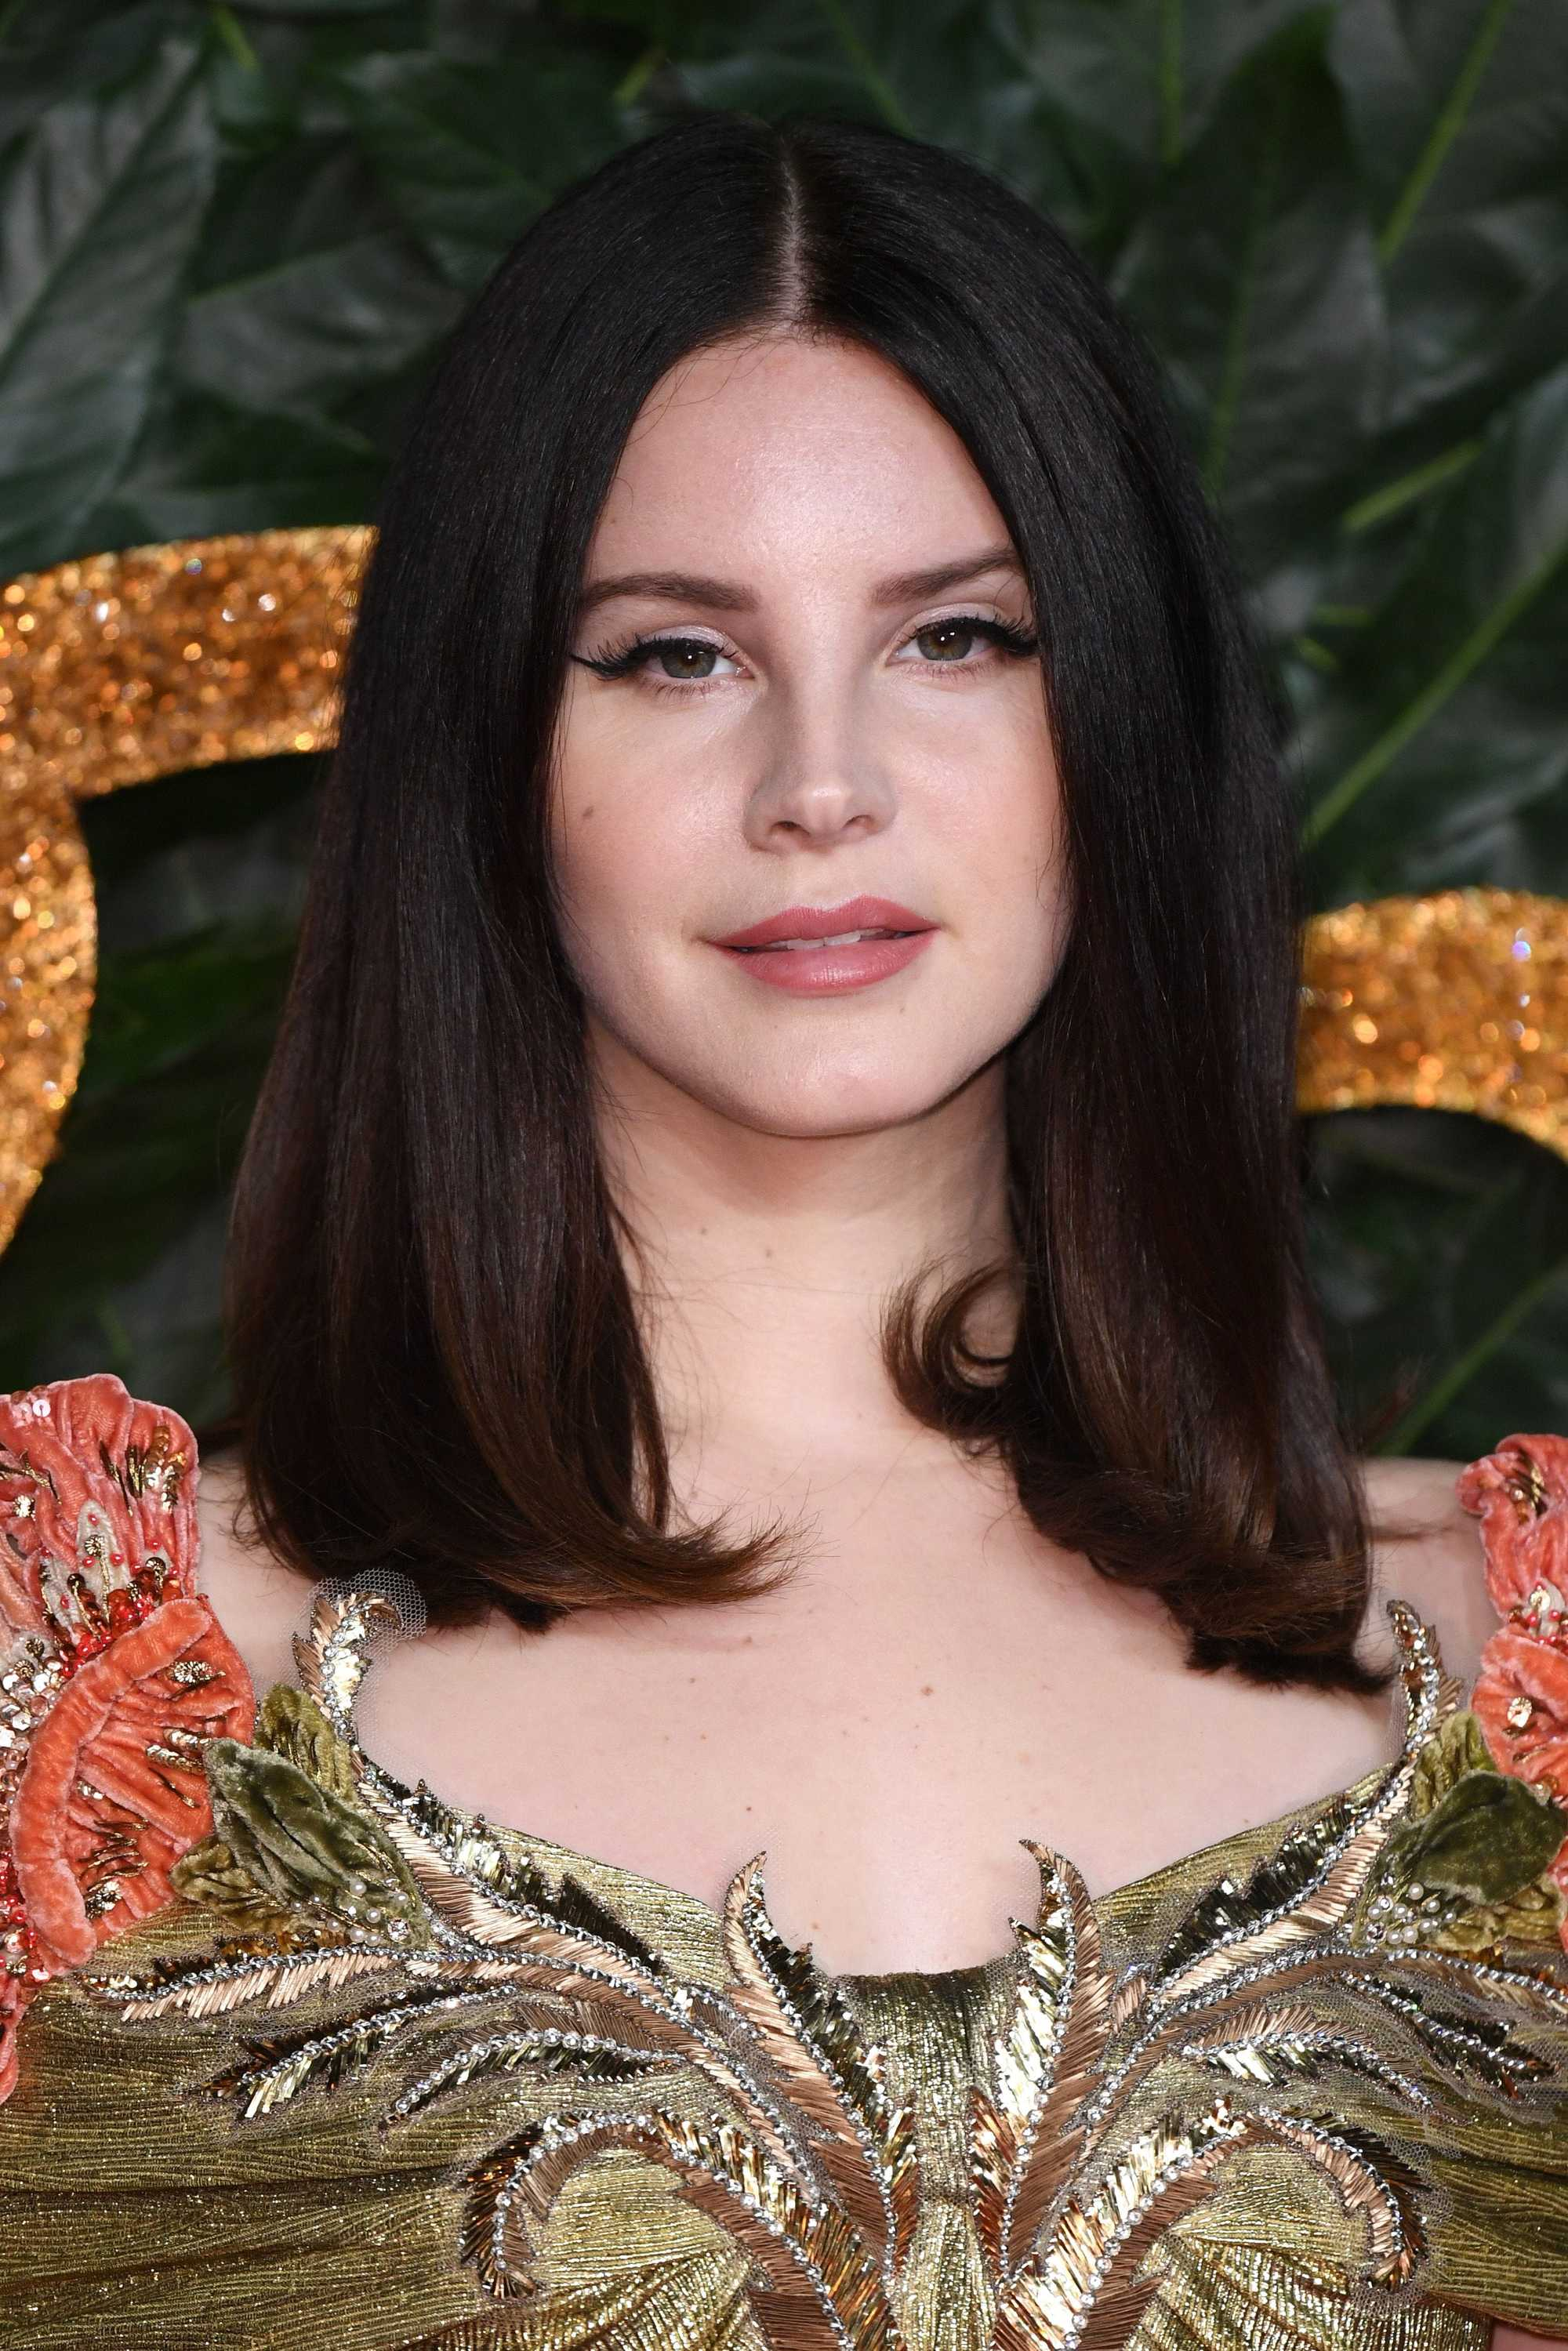 The Fashion Awards 2018: Lana Del Rey with short shoulder length brunette hair, wearing Gucci